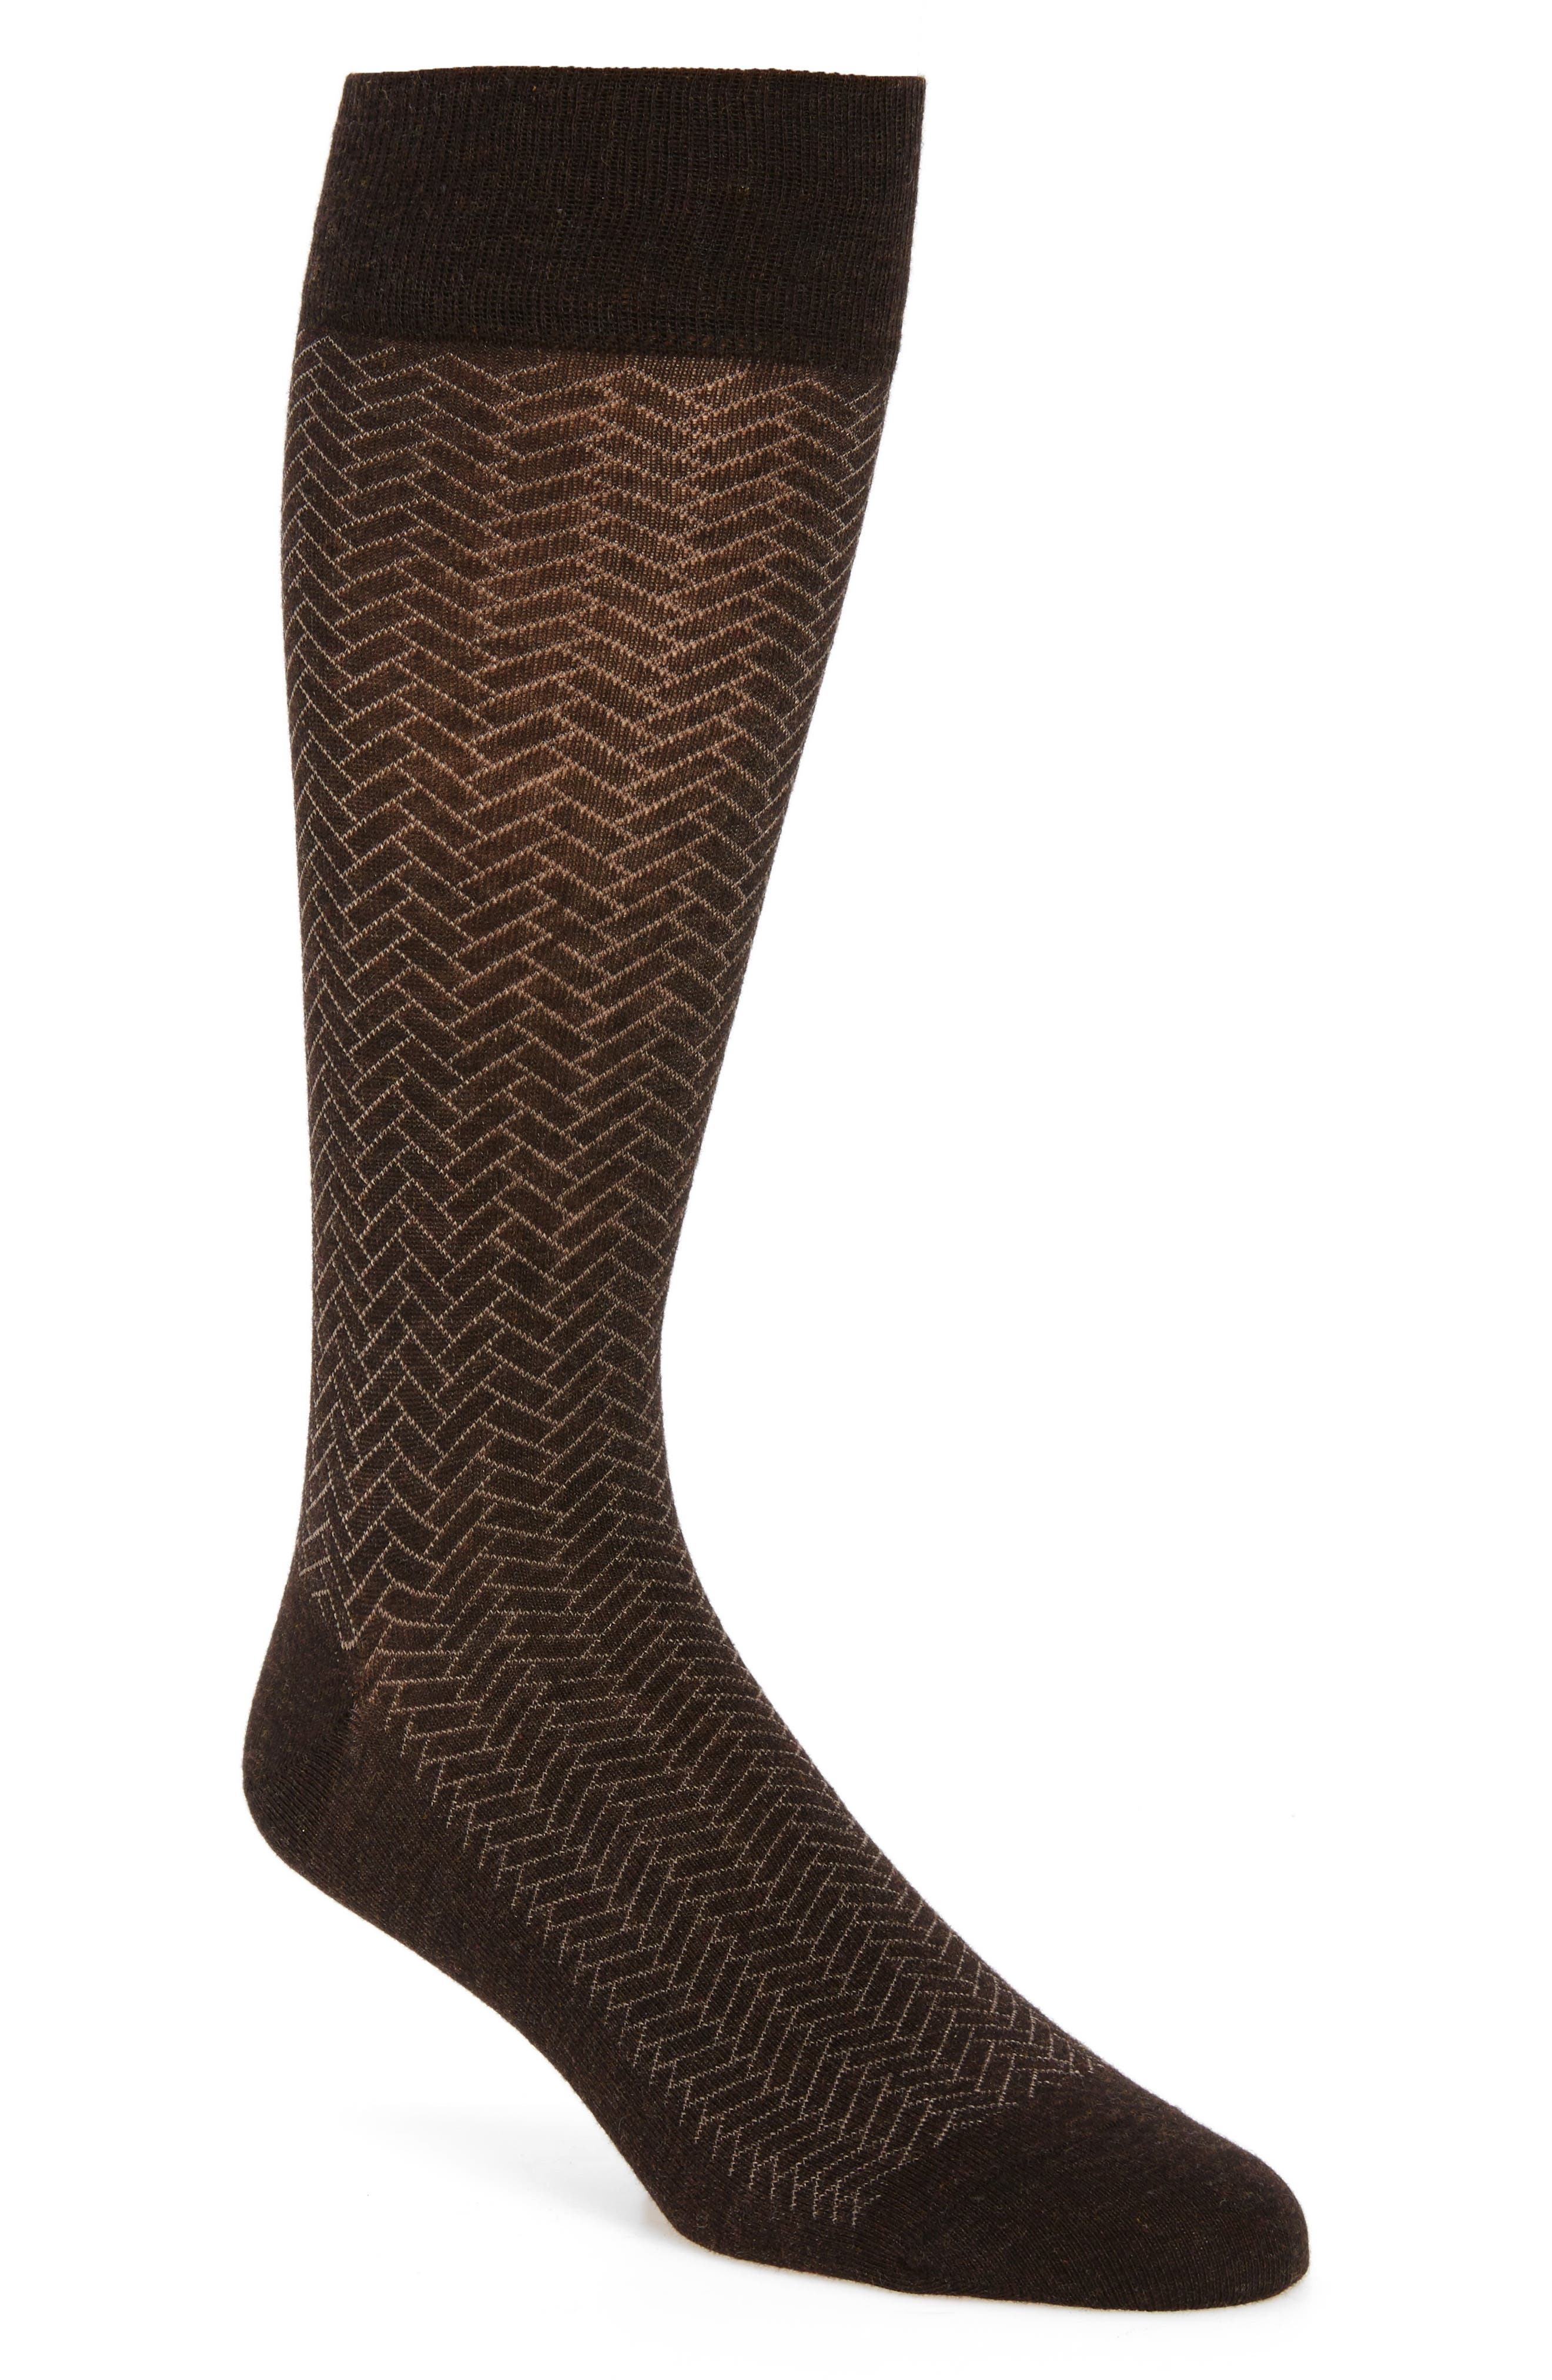 Vintage Men's Socks History-1900 to 1960s Mens Cole Haan Geometric Crew Socks Size One Size - Brown $12.50 AT vintagedancer.com